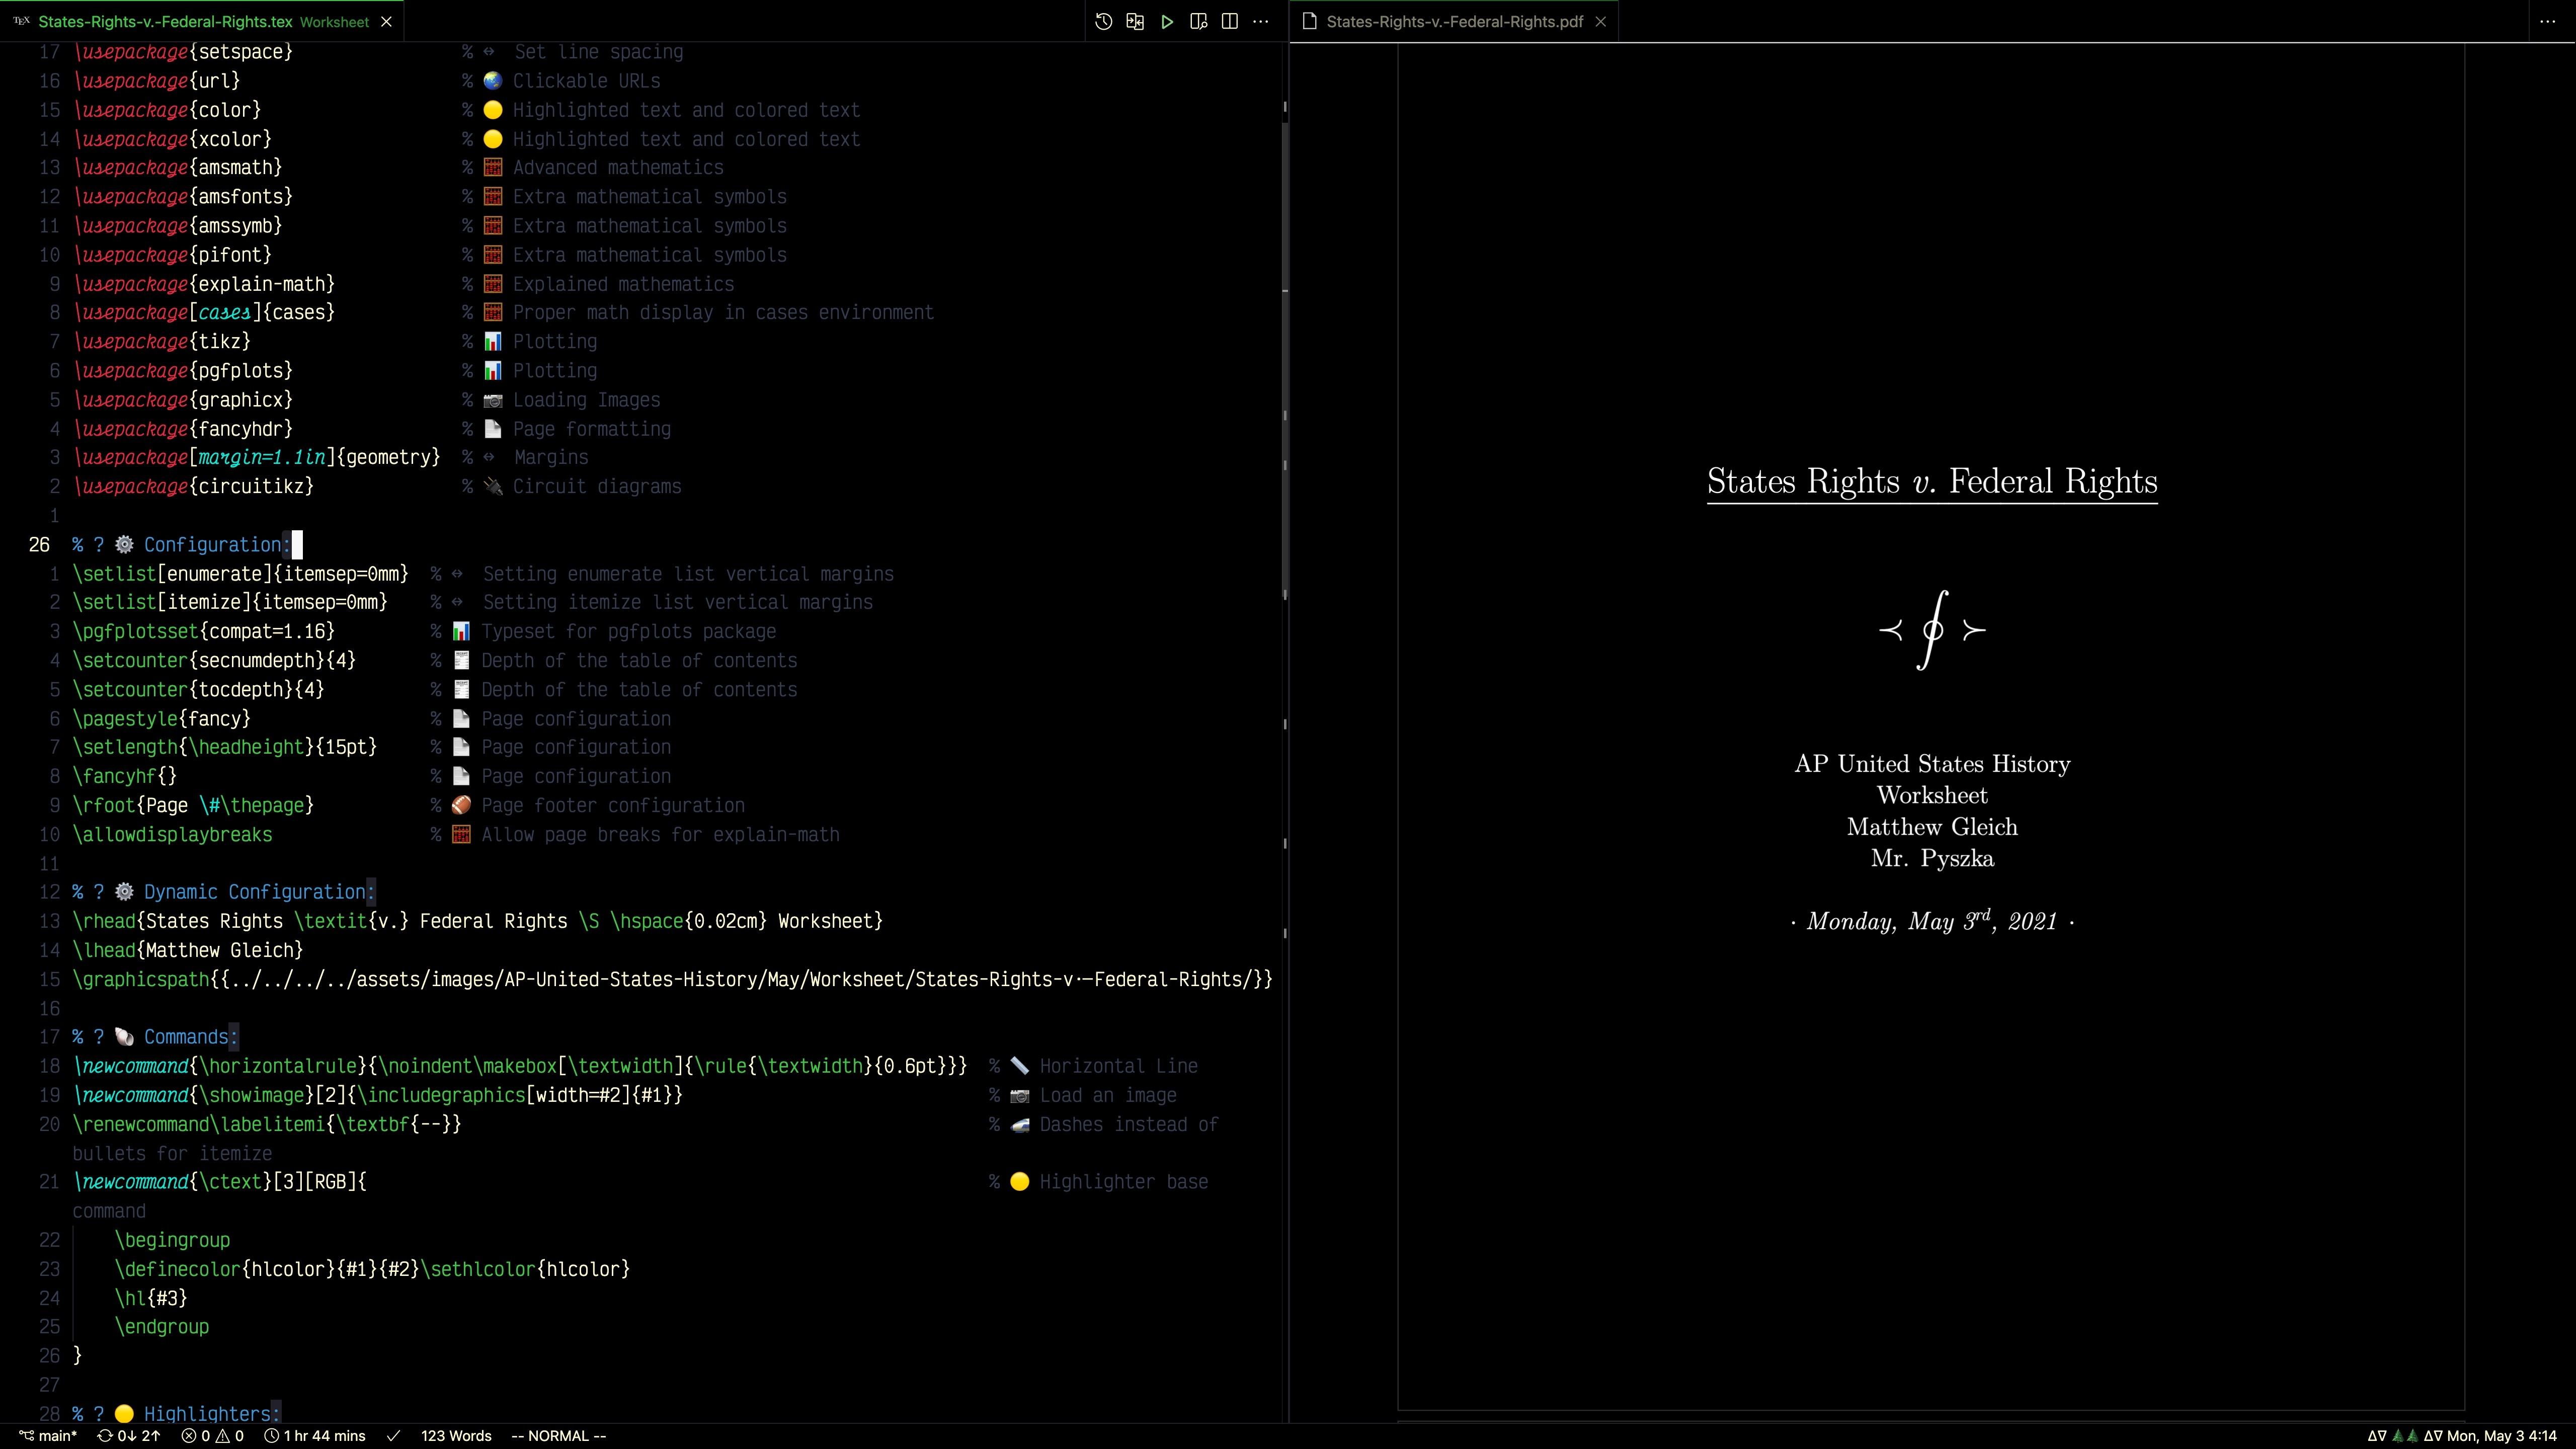 https://cloud-85ottxvx5-hack-club-bot.vercel.app/0screen_shot_2021-05-03_at_4.14.33_pm.jpg